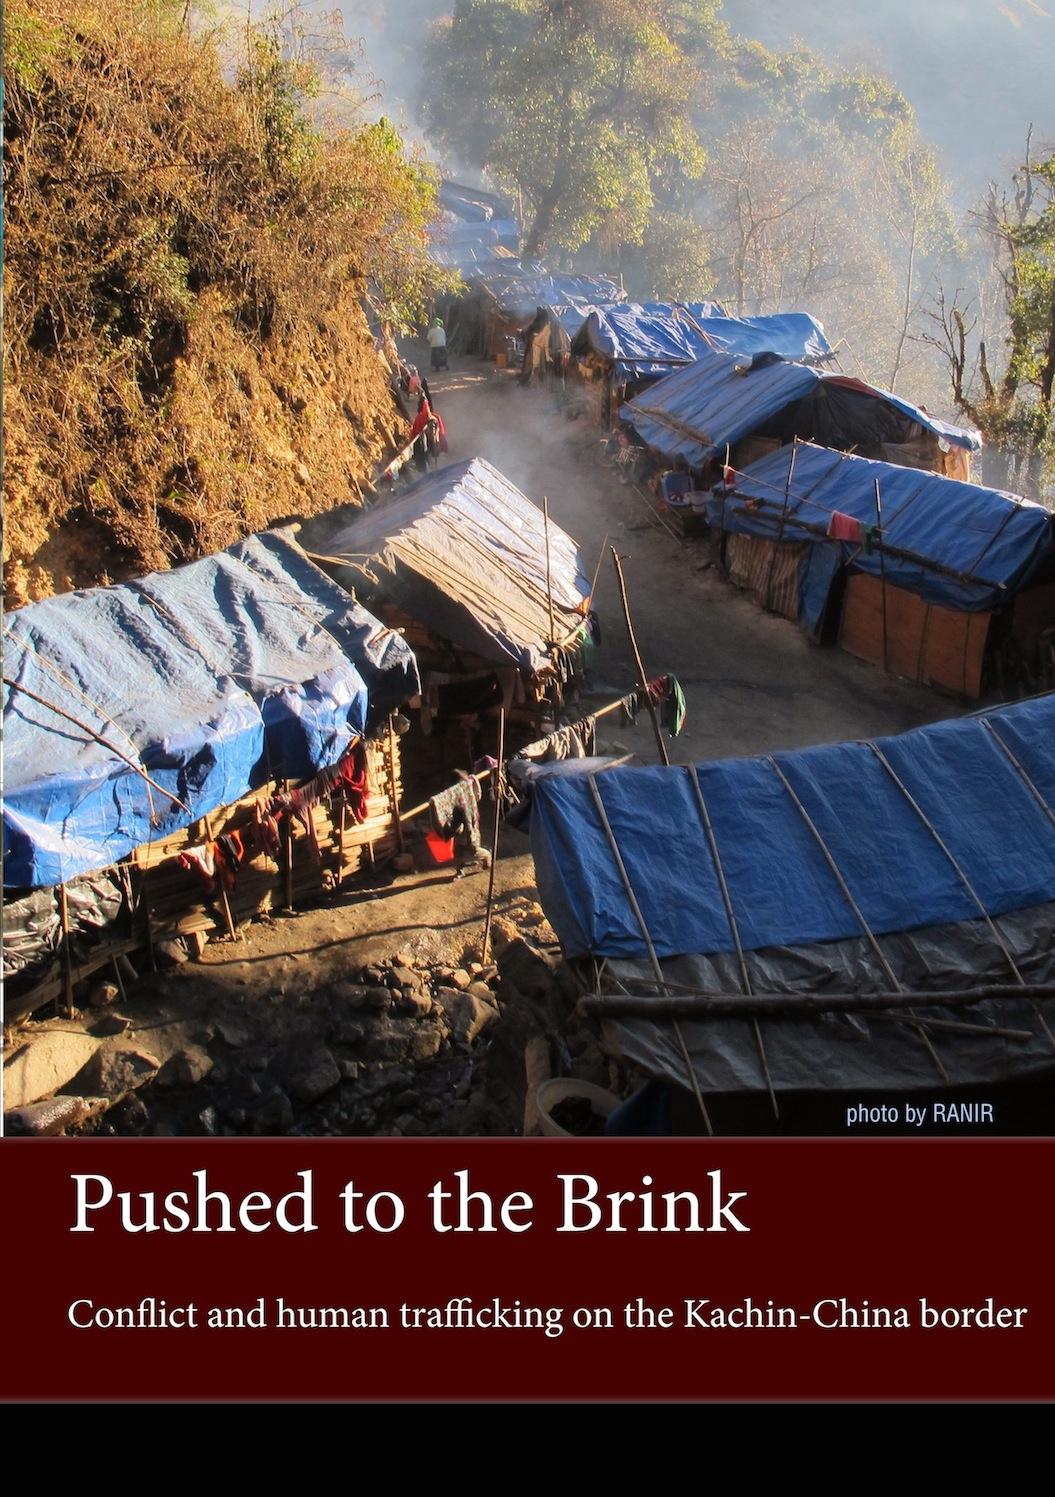 Photo of Burma's Kachin State War Preys On Most Vulnerable